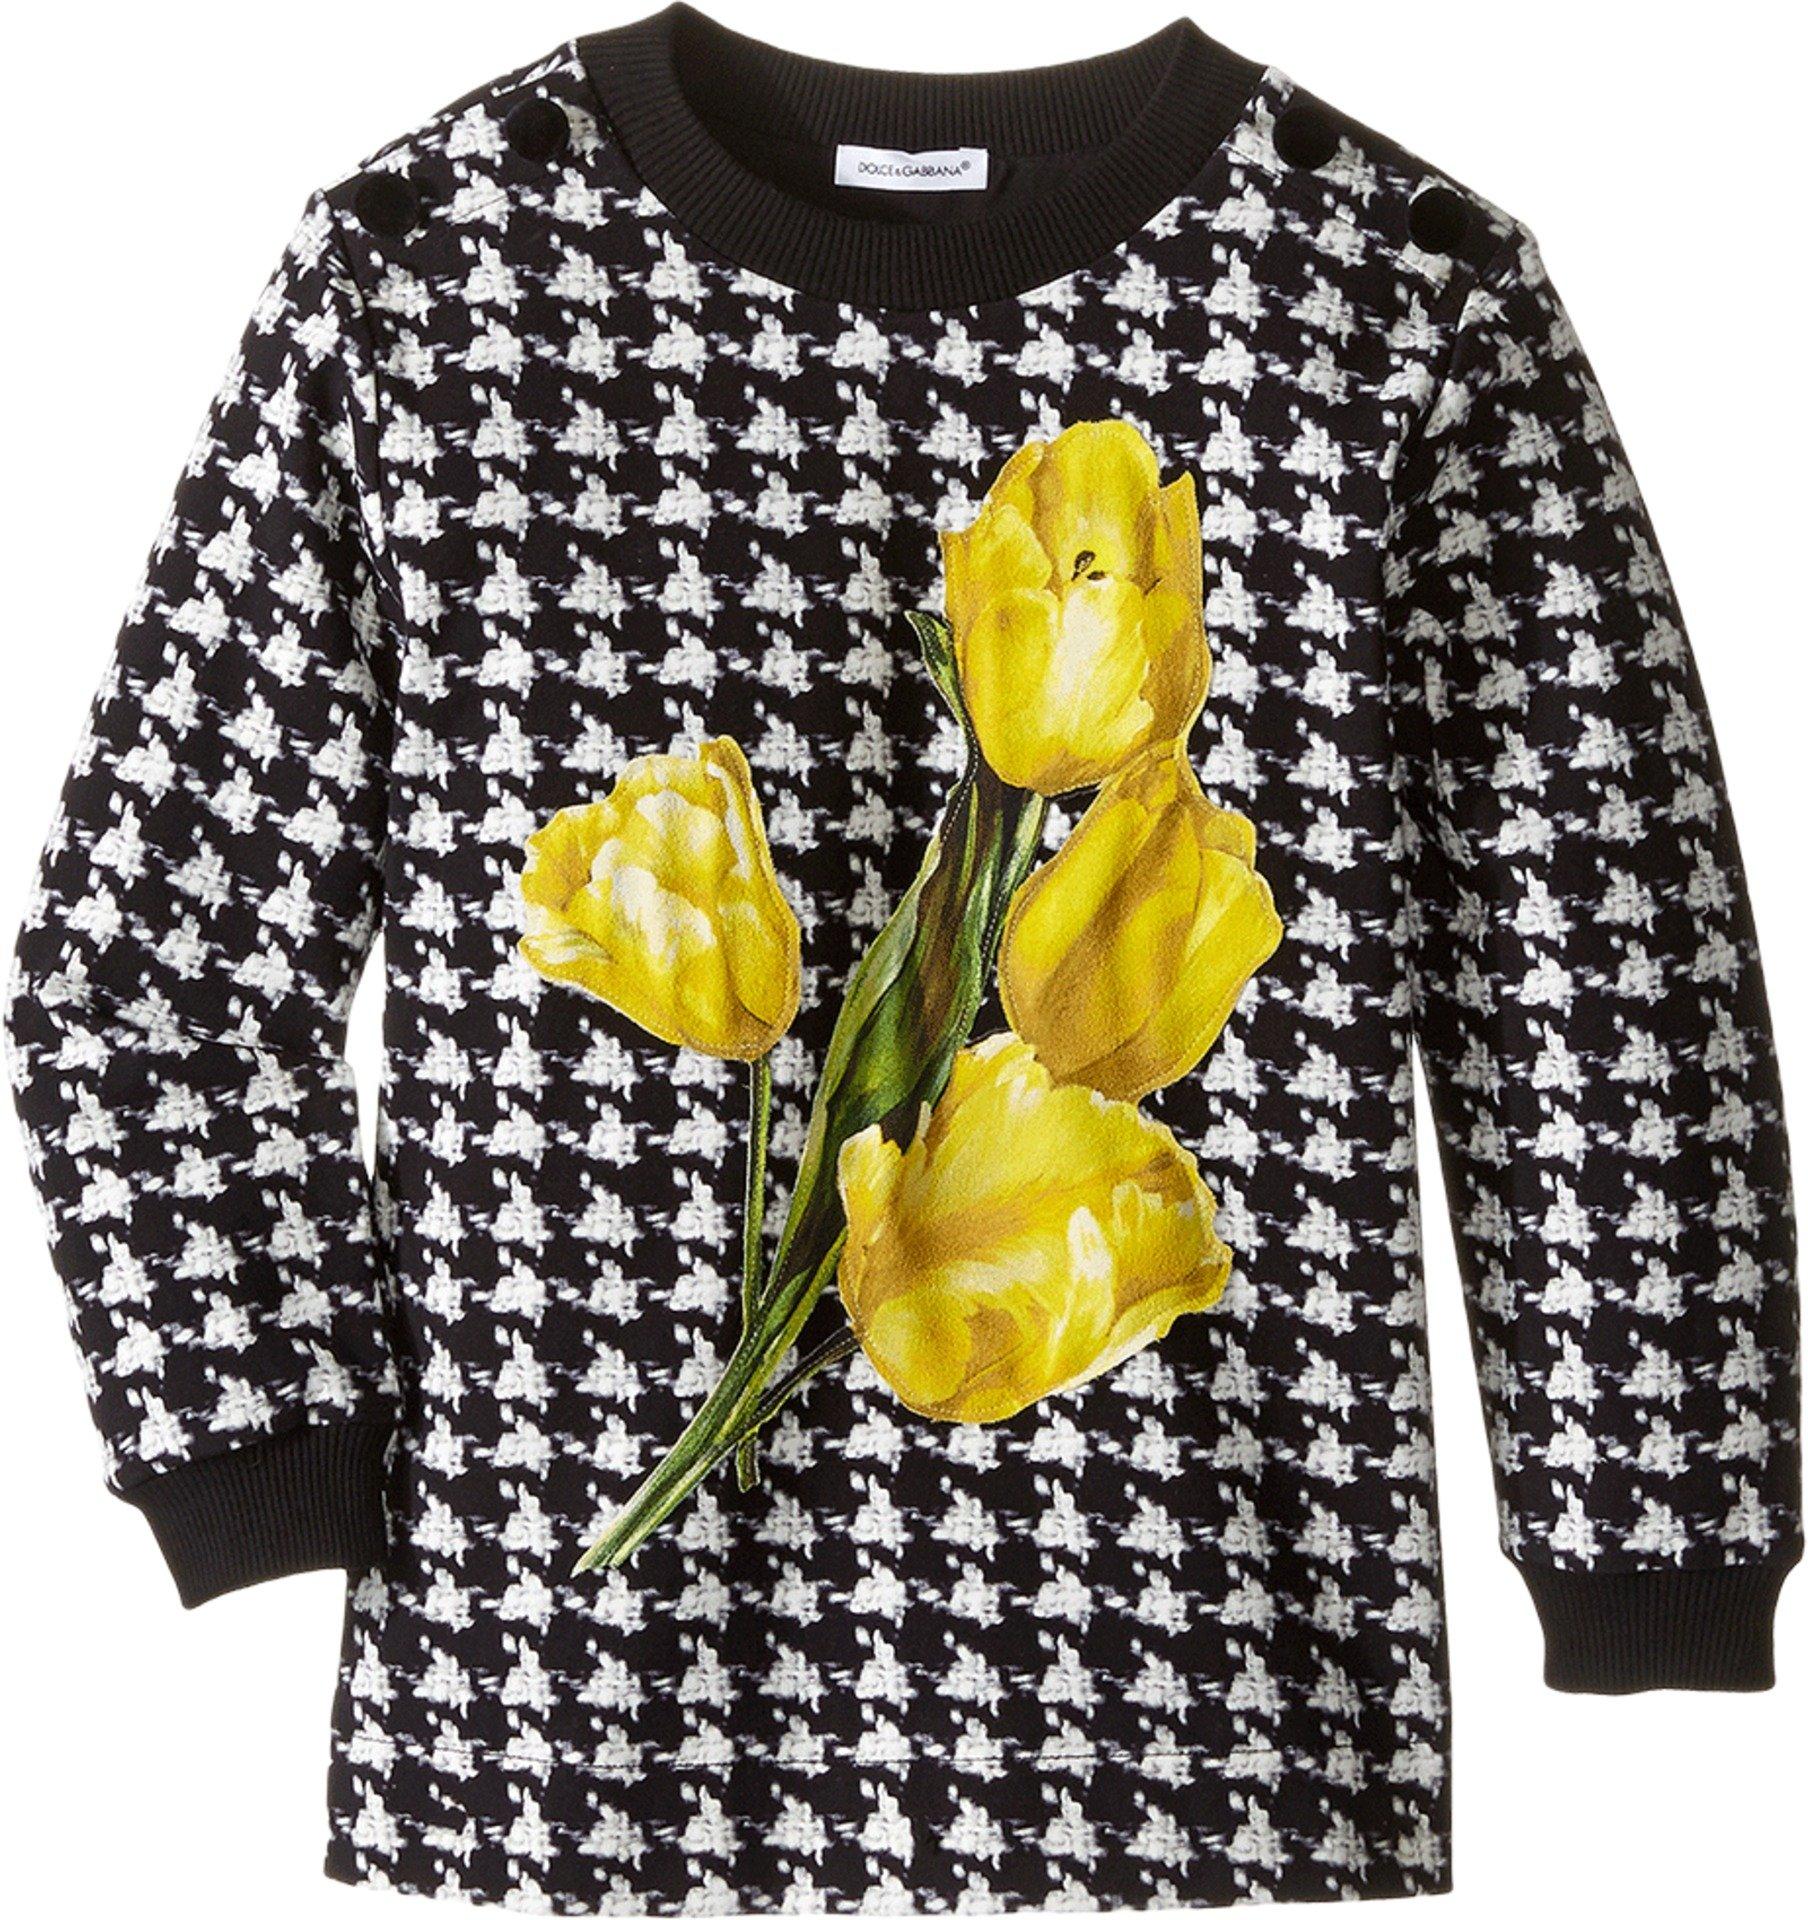 Dolce & Gabbana Kids Baby Girl's City Houndstooth Sweater (Toddler/Little Kids) Black/White Print Sweater